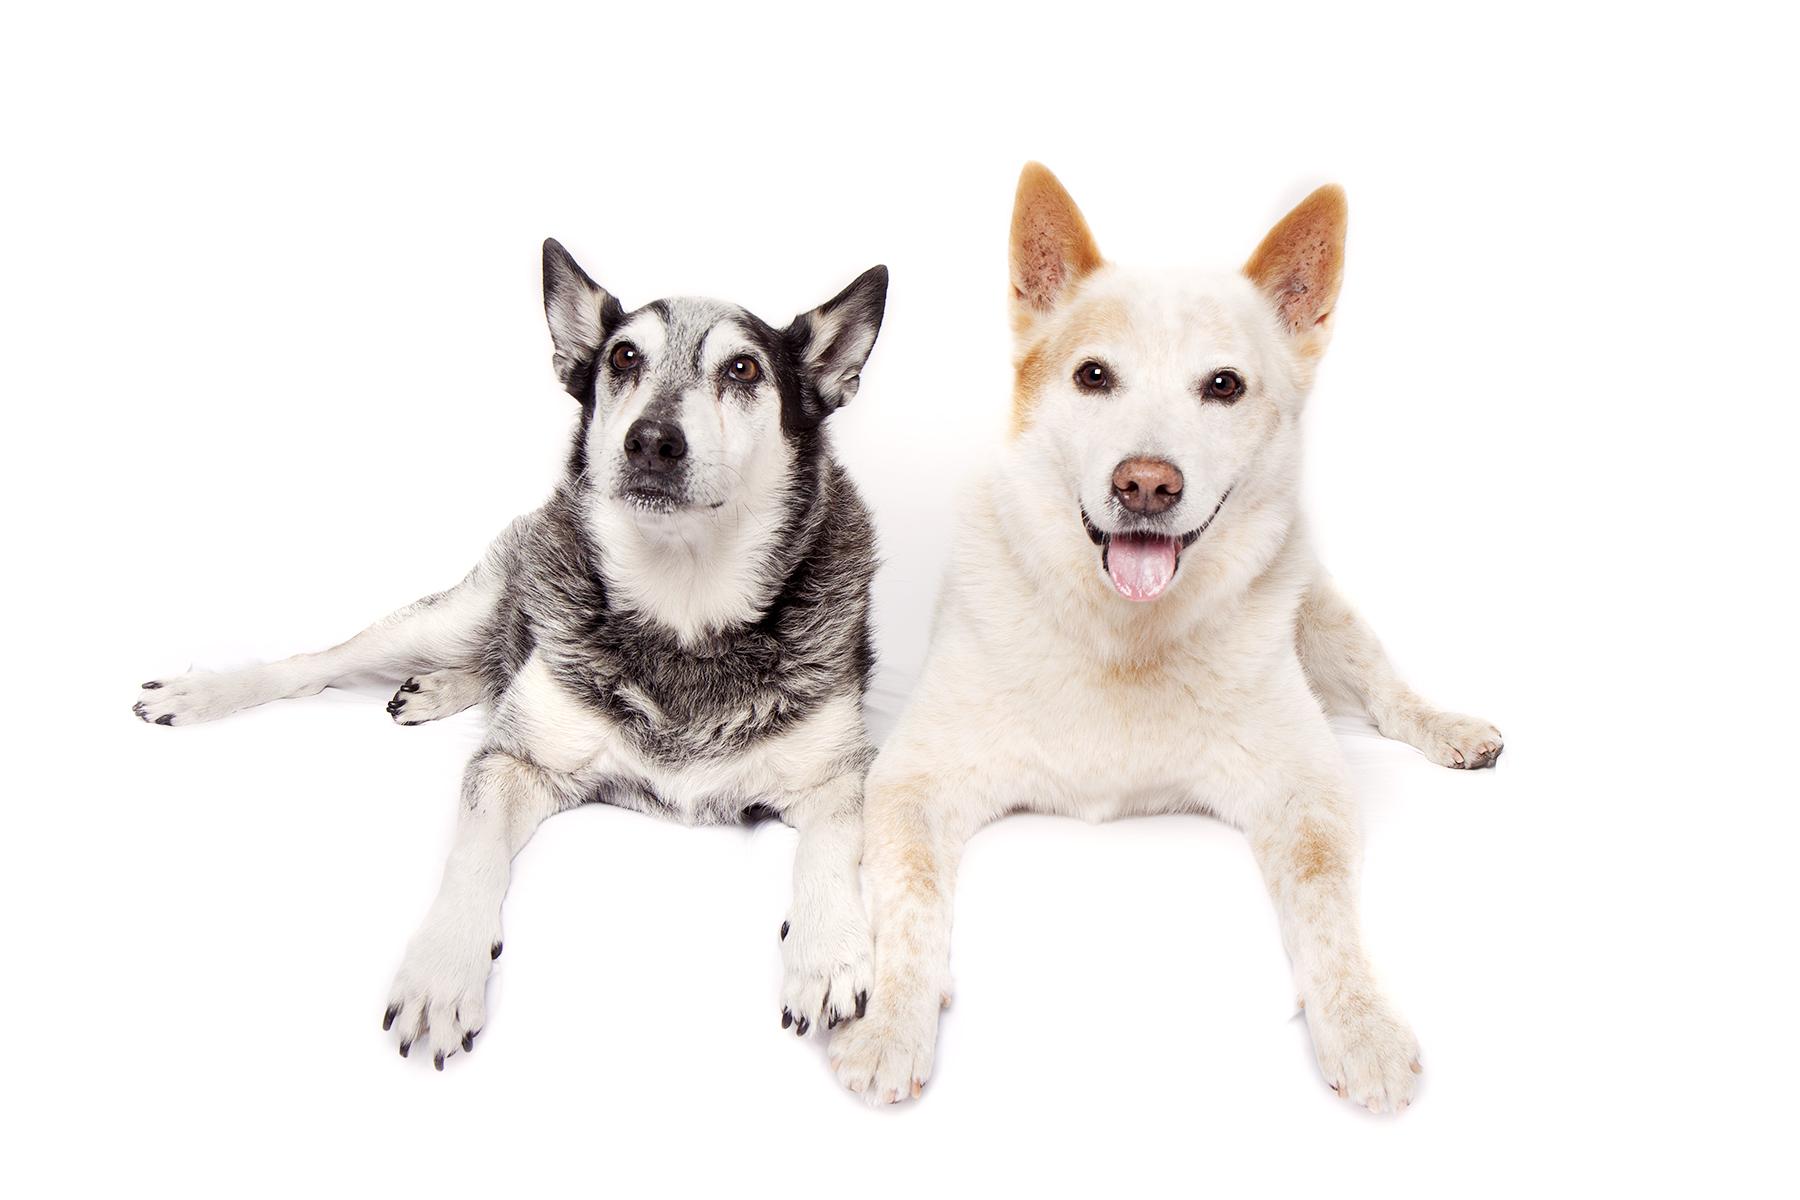 Two cute doggos